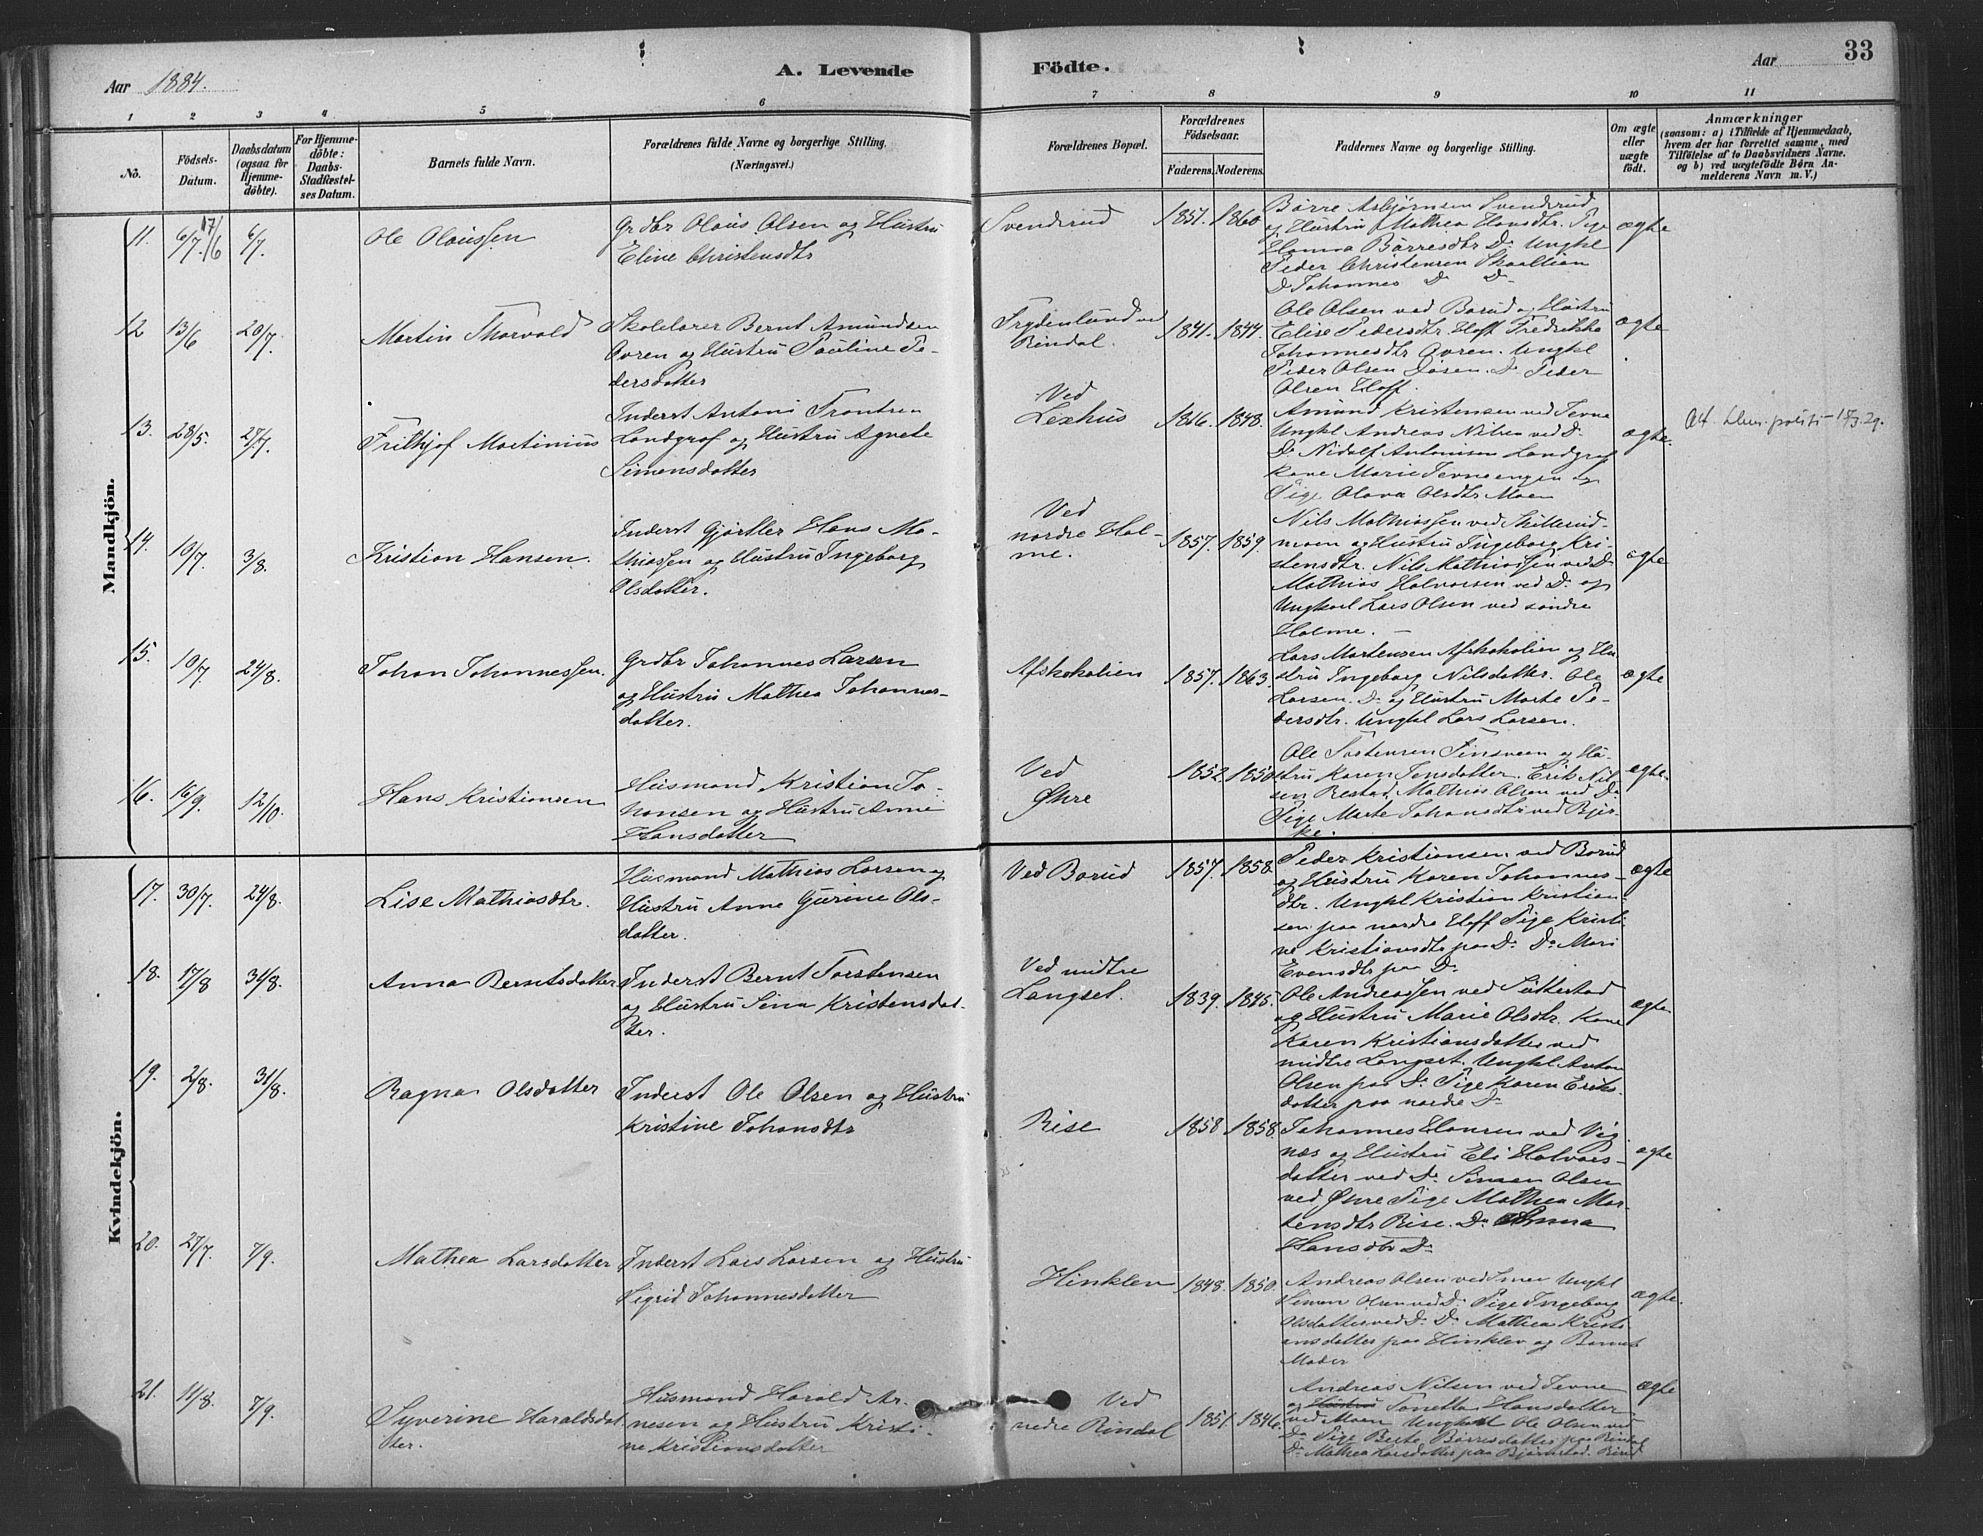 SAH, Fåberg prestekontor, Ministerialbok nr. 9, 1879-1898, s. 33